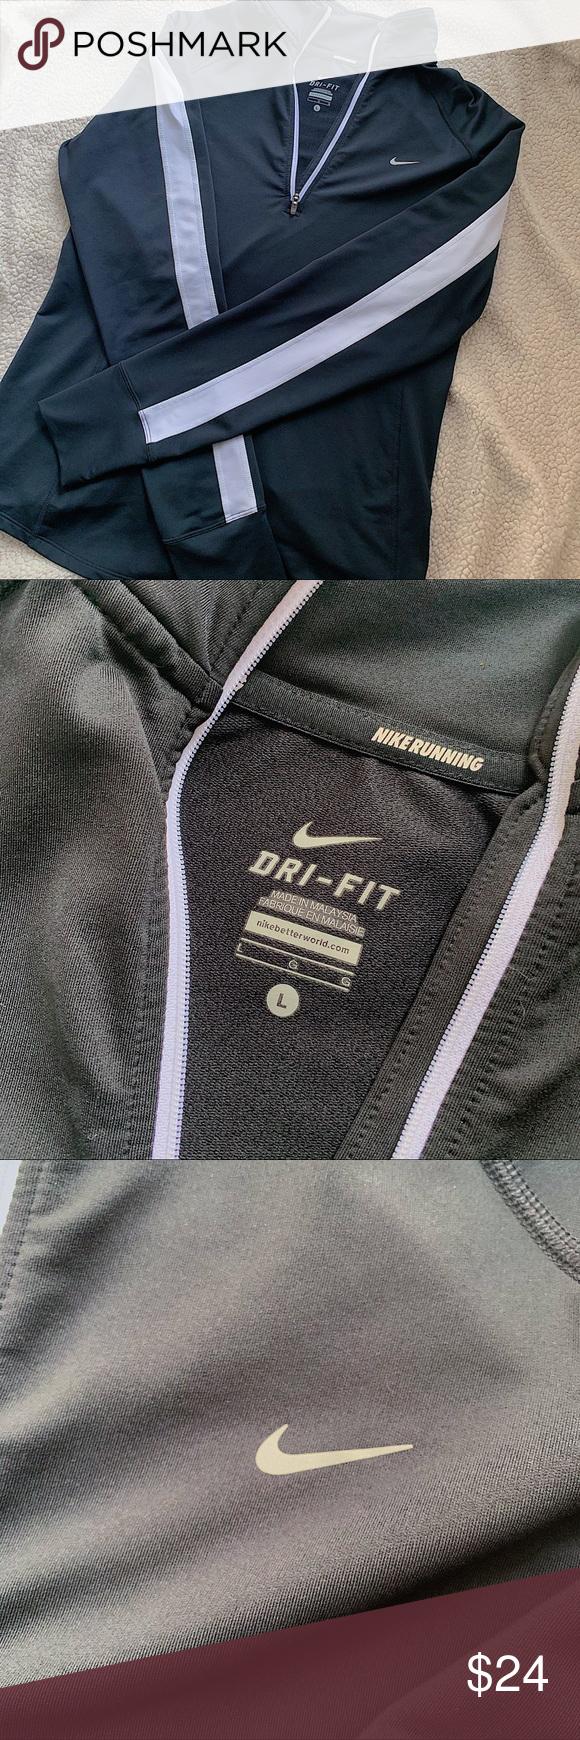 Nike Running Dri Fit Half Quarter Zip Up Pullover Nike Dri